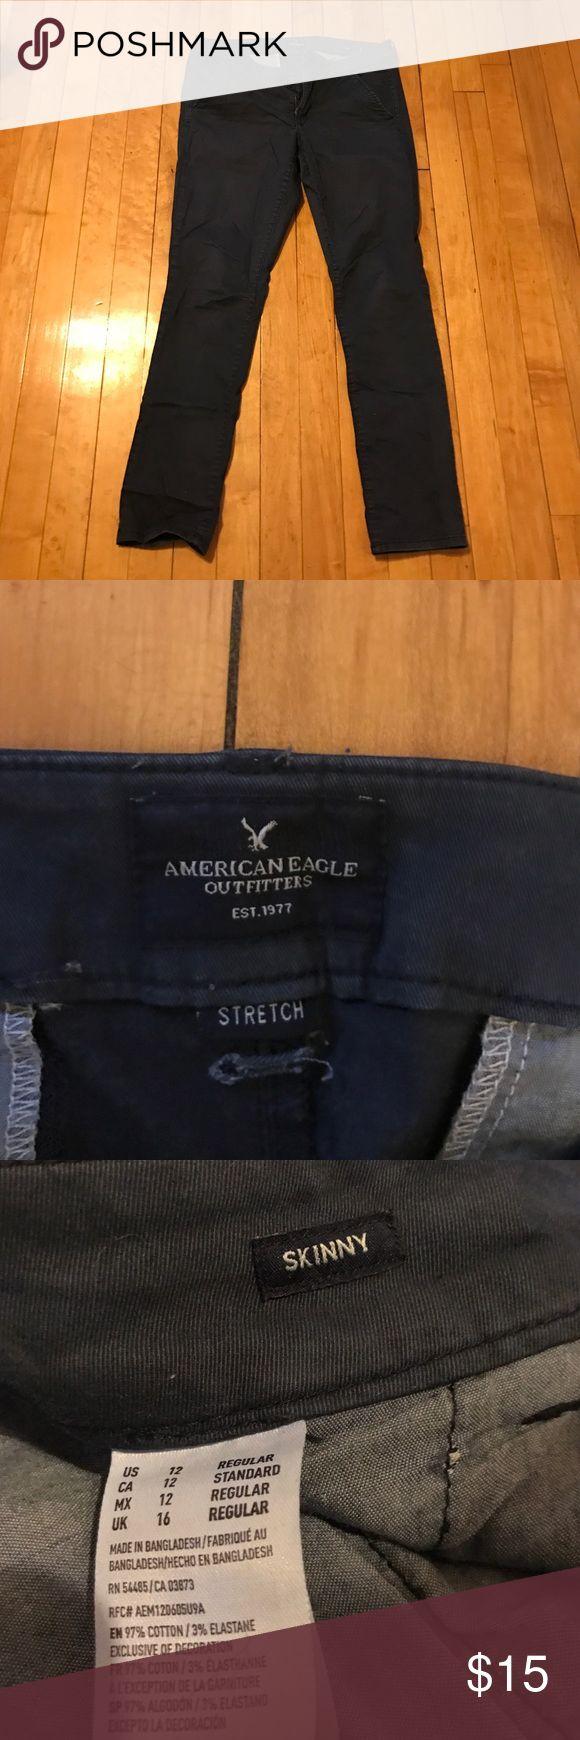 Women's navy khaki skinny American eagle pants Skinny American eagle khaki pants American Eagle Outfitters Pants Skinny